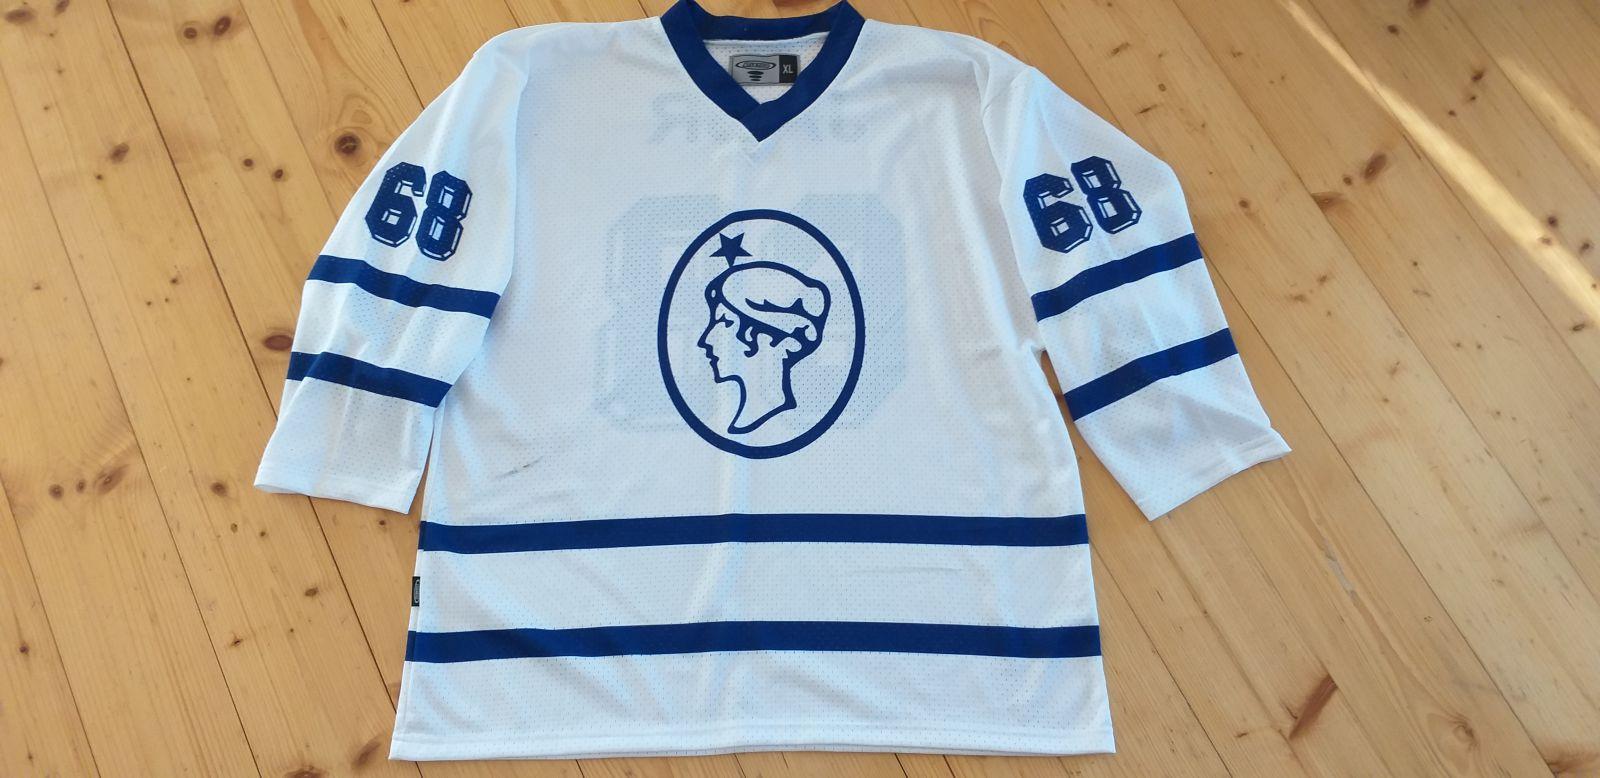 16b0d90e79bc9 Hokejové dresy pro sběratele